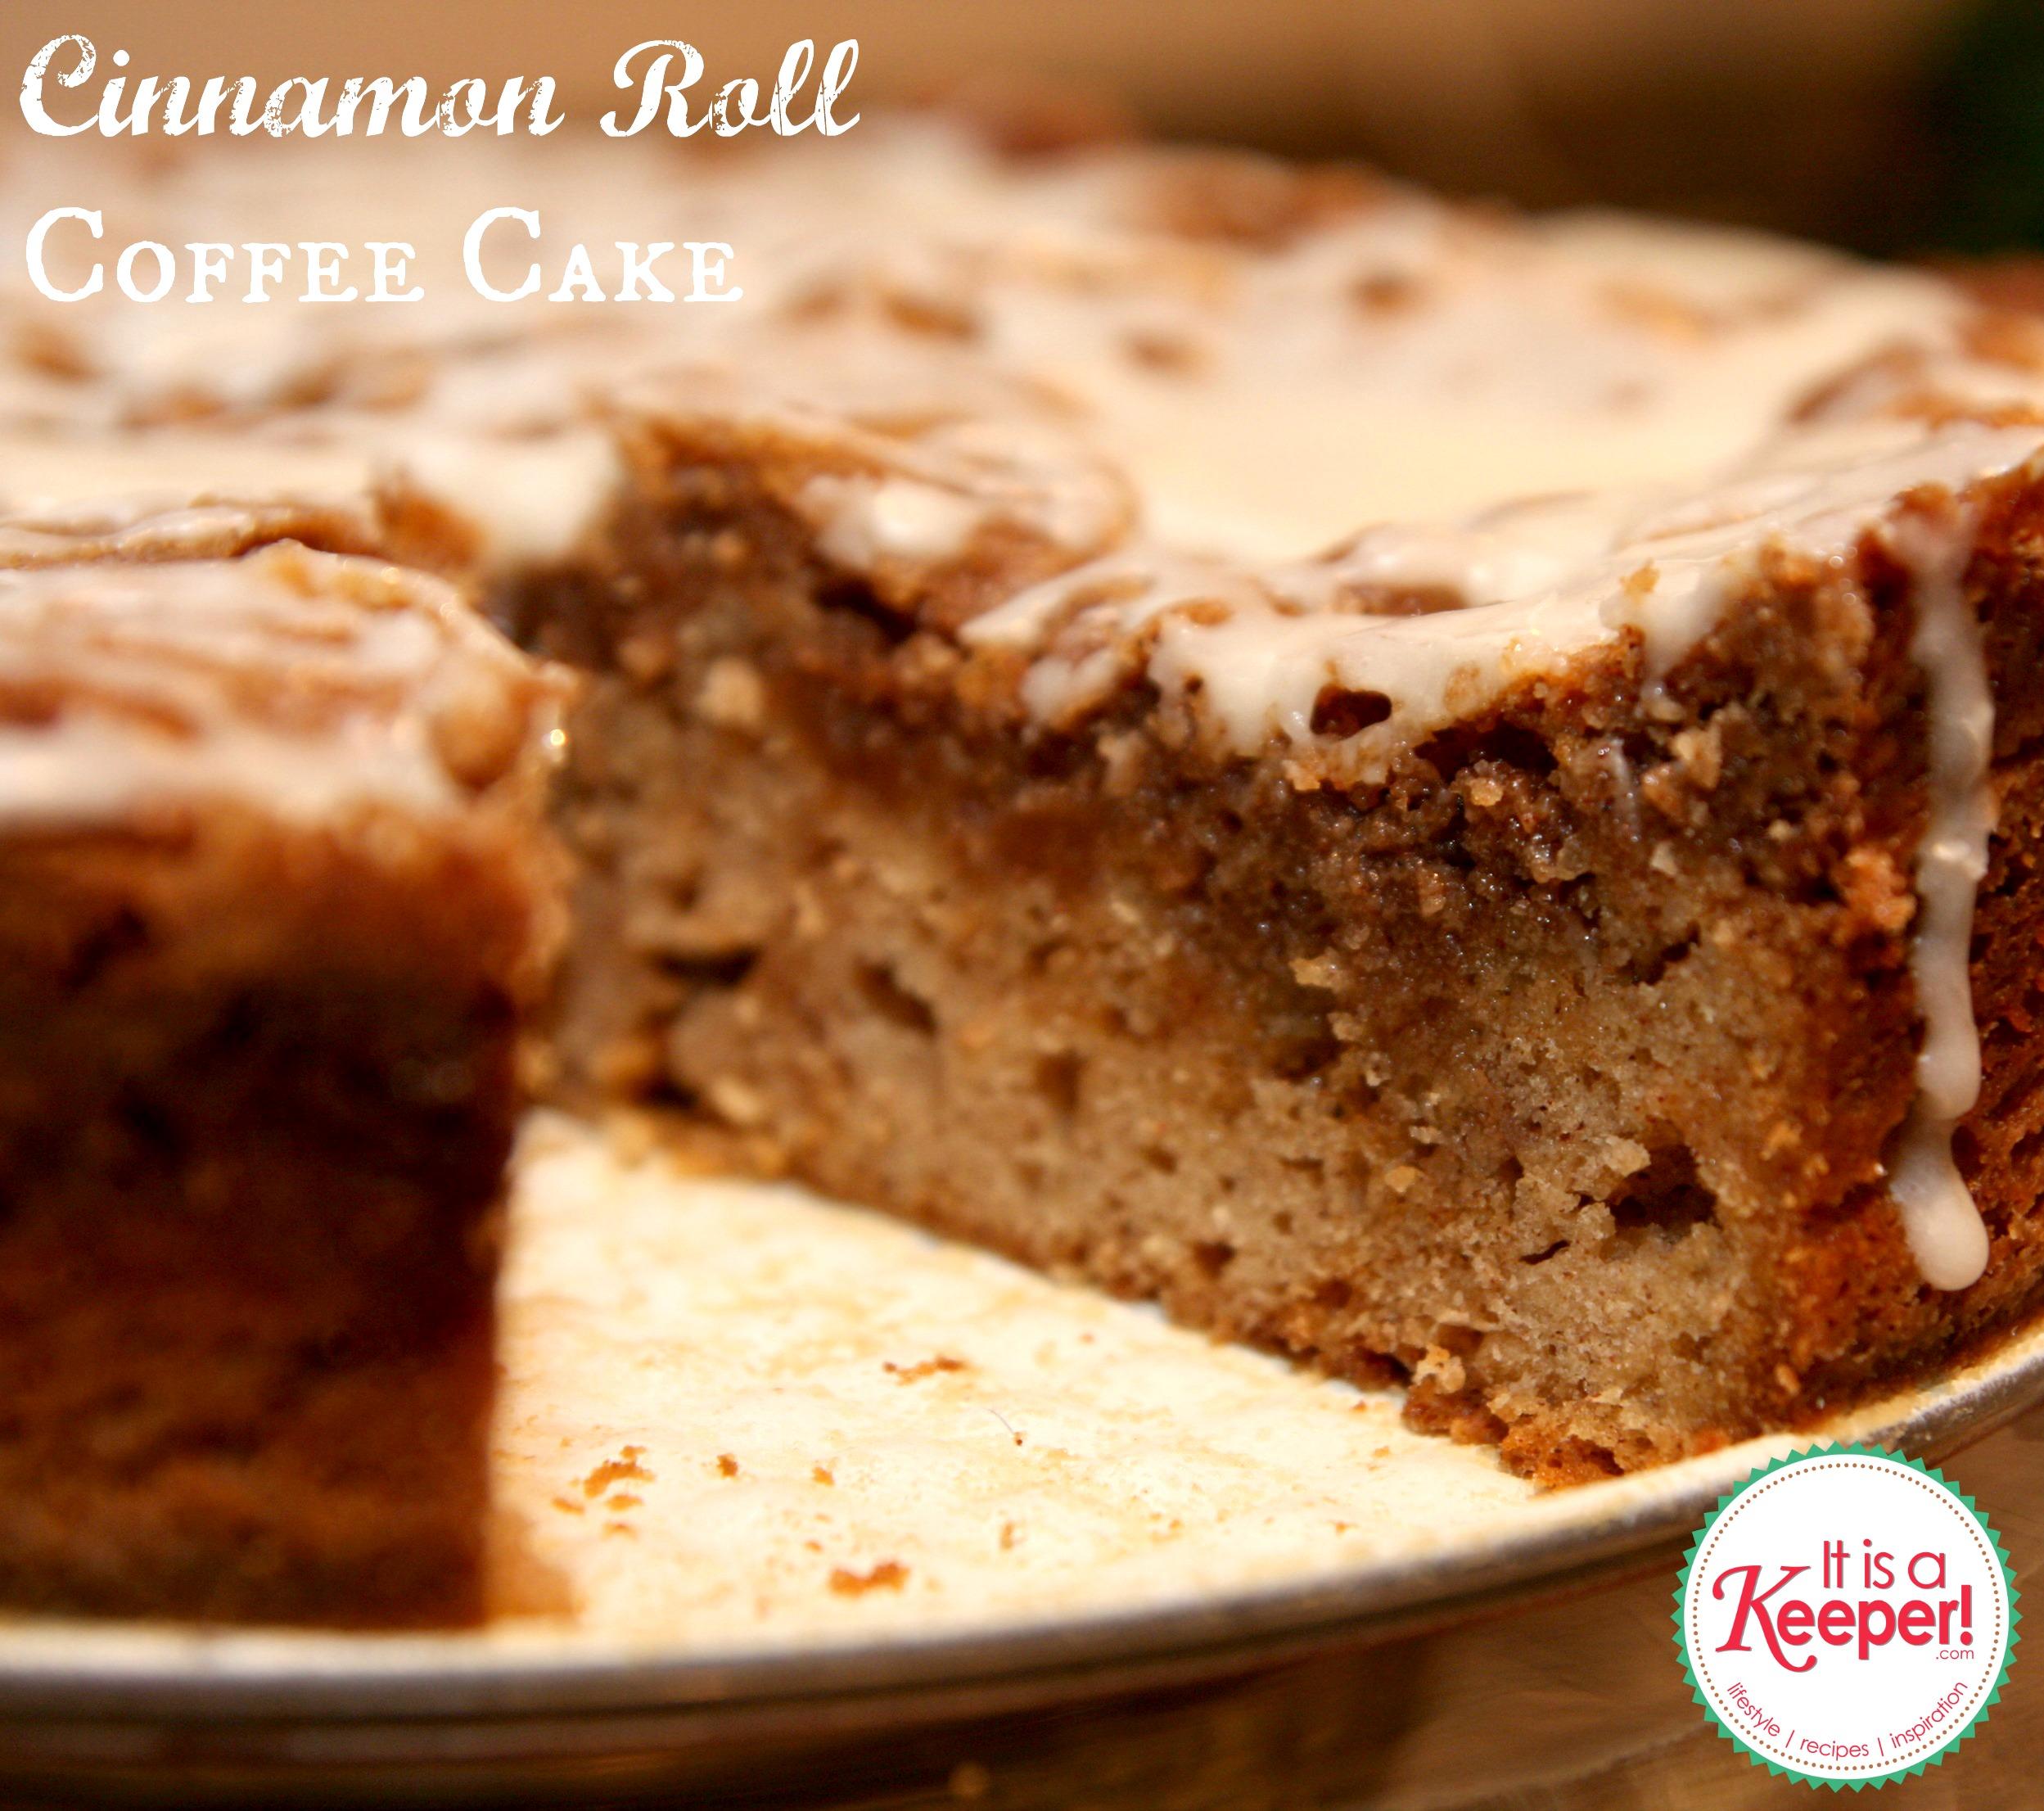 Holiday Recipes: Cinnamon Roll Coffee Cake